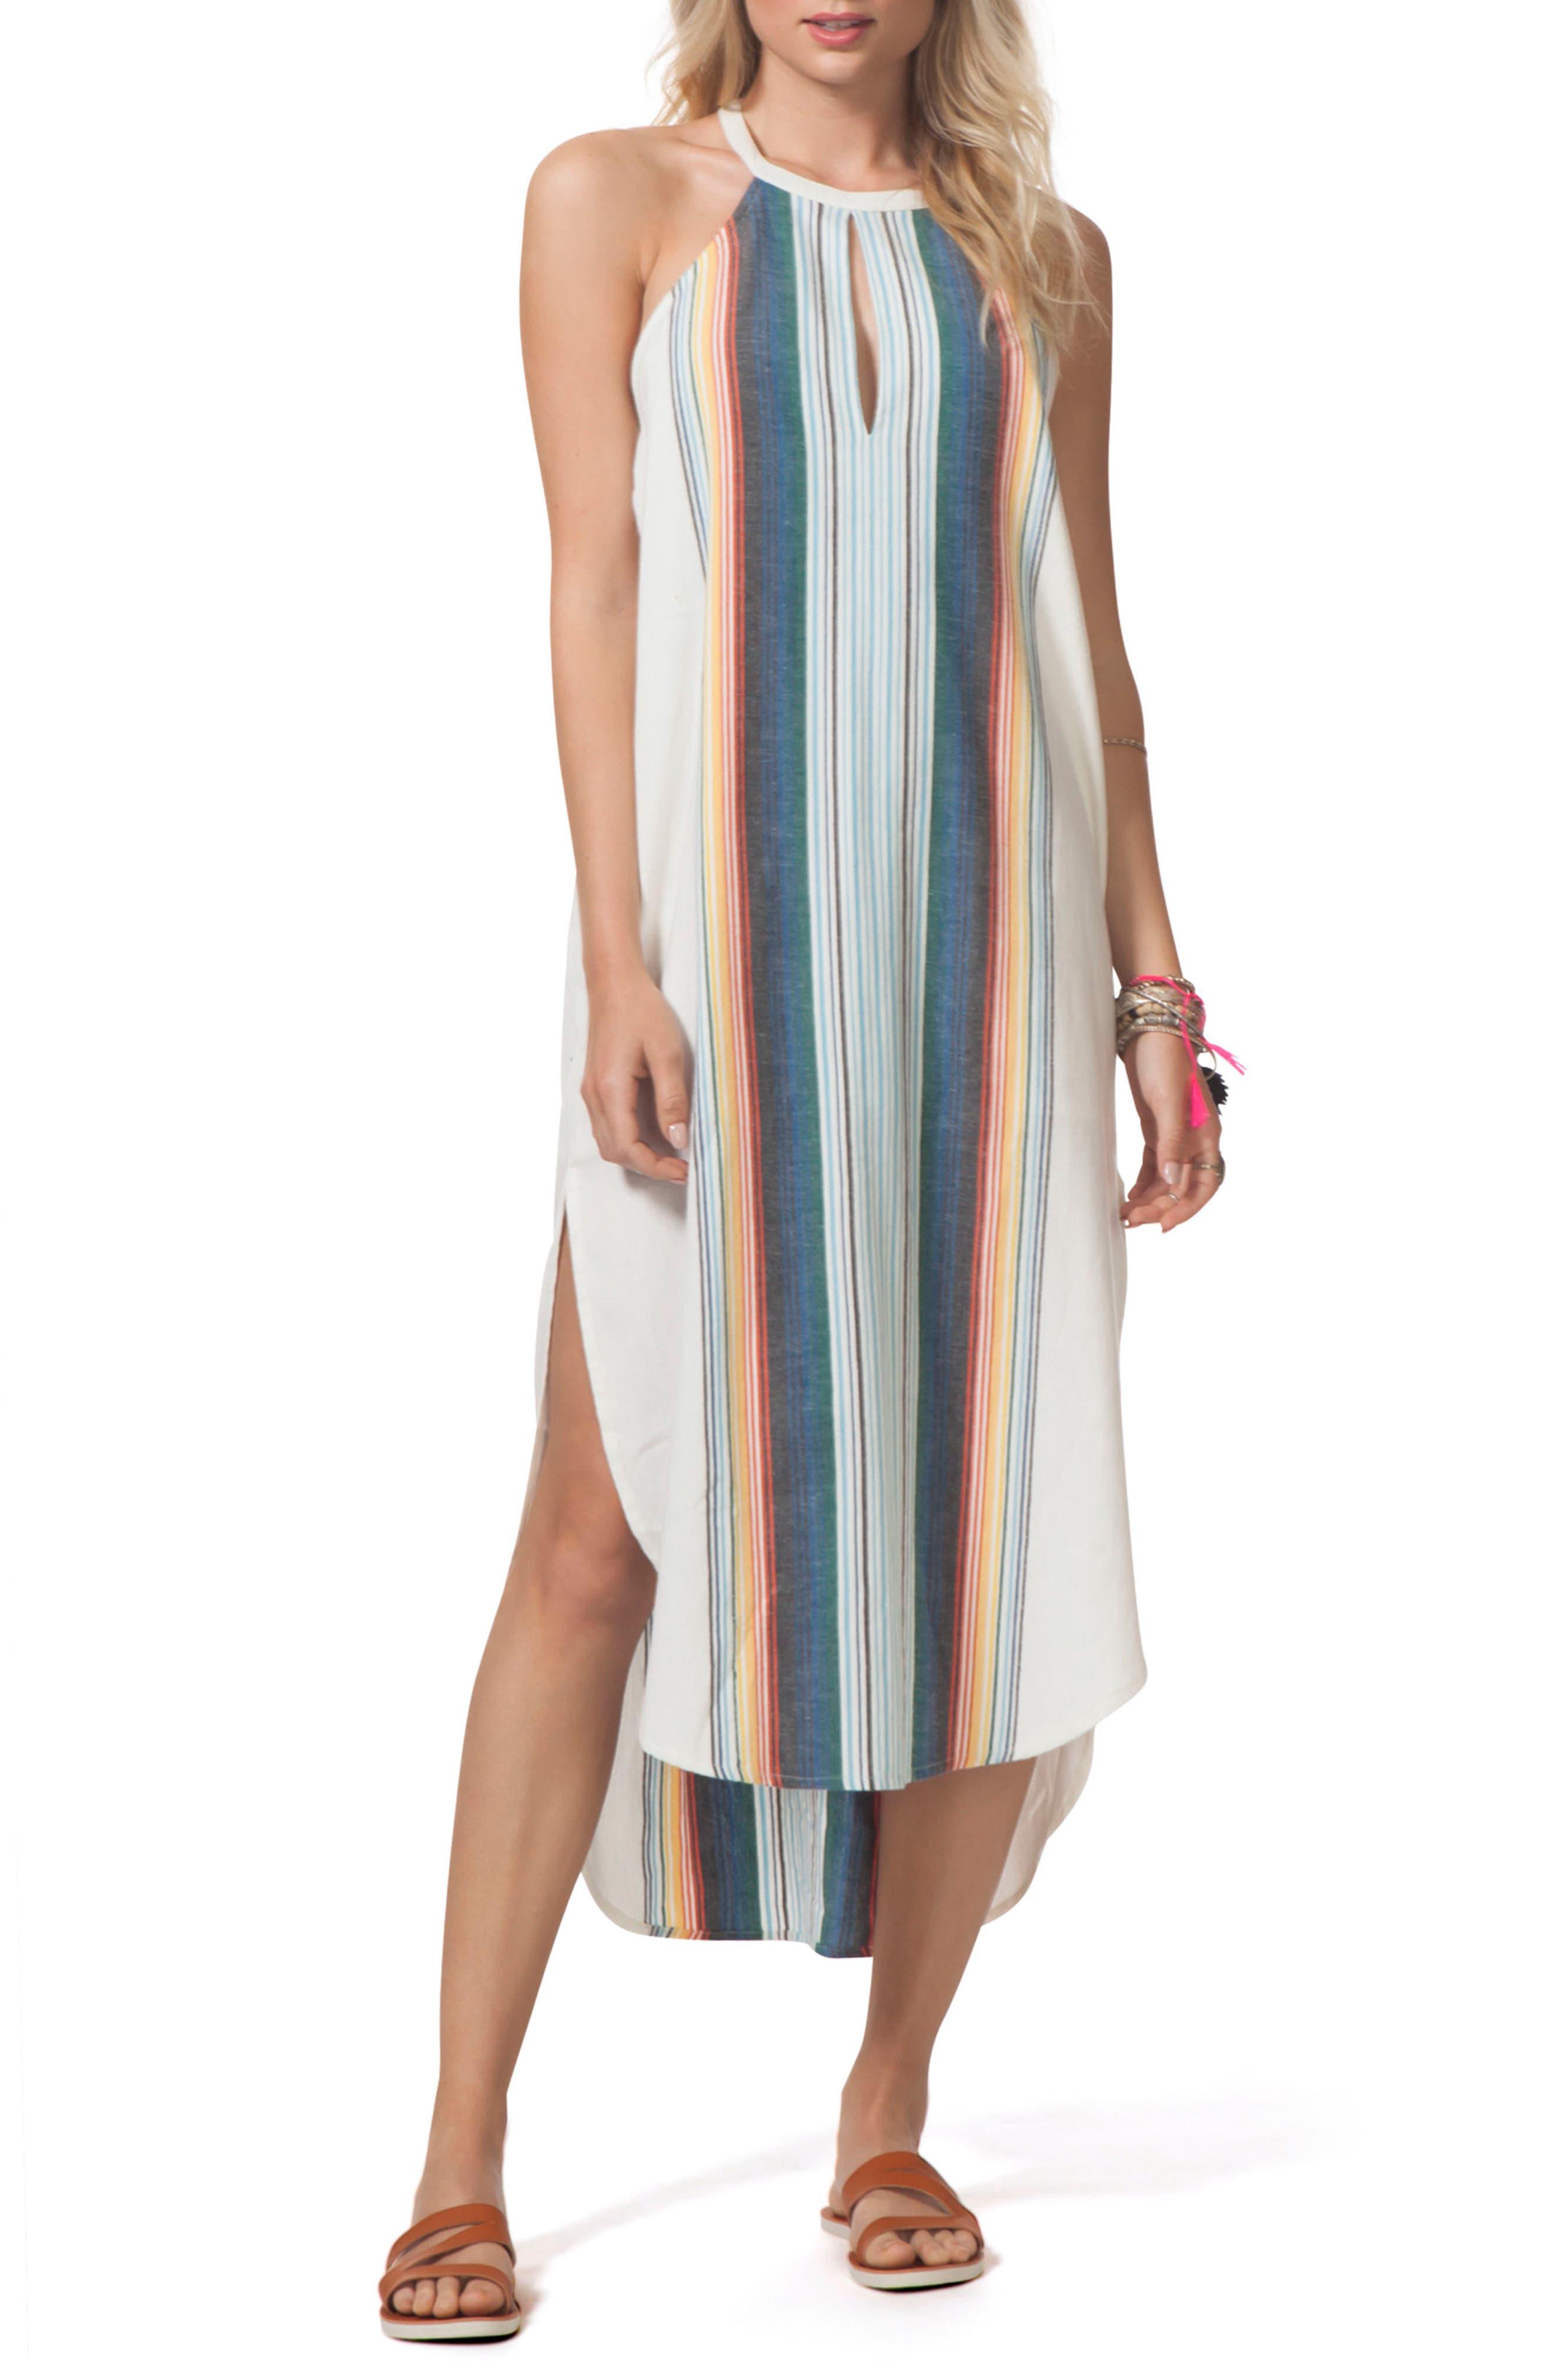 Beach Bazaar Maxi Dress,                             Main thumbnail 1, color,                             Vanilla